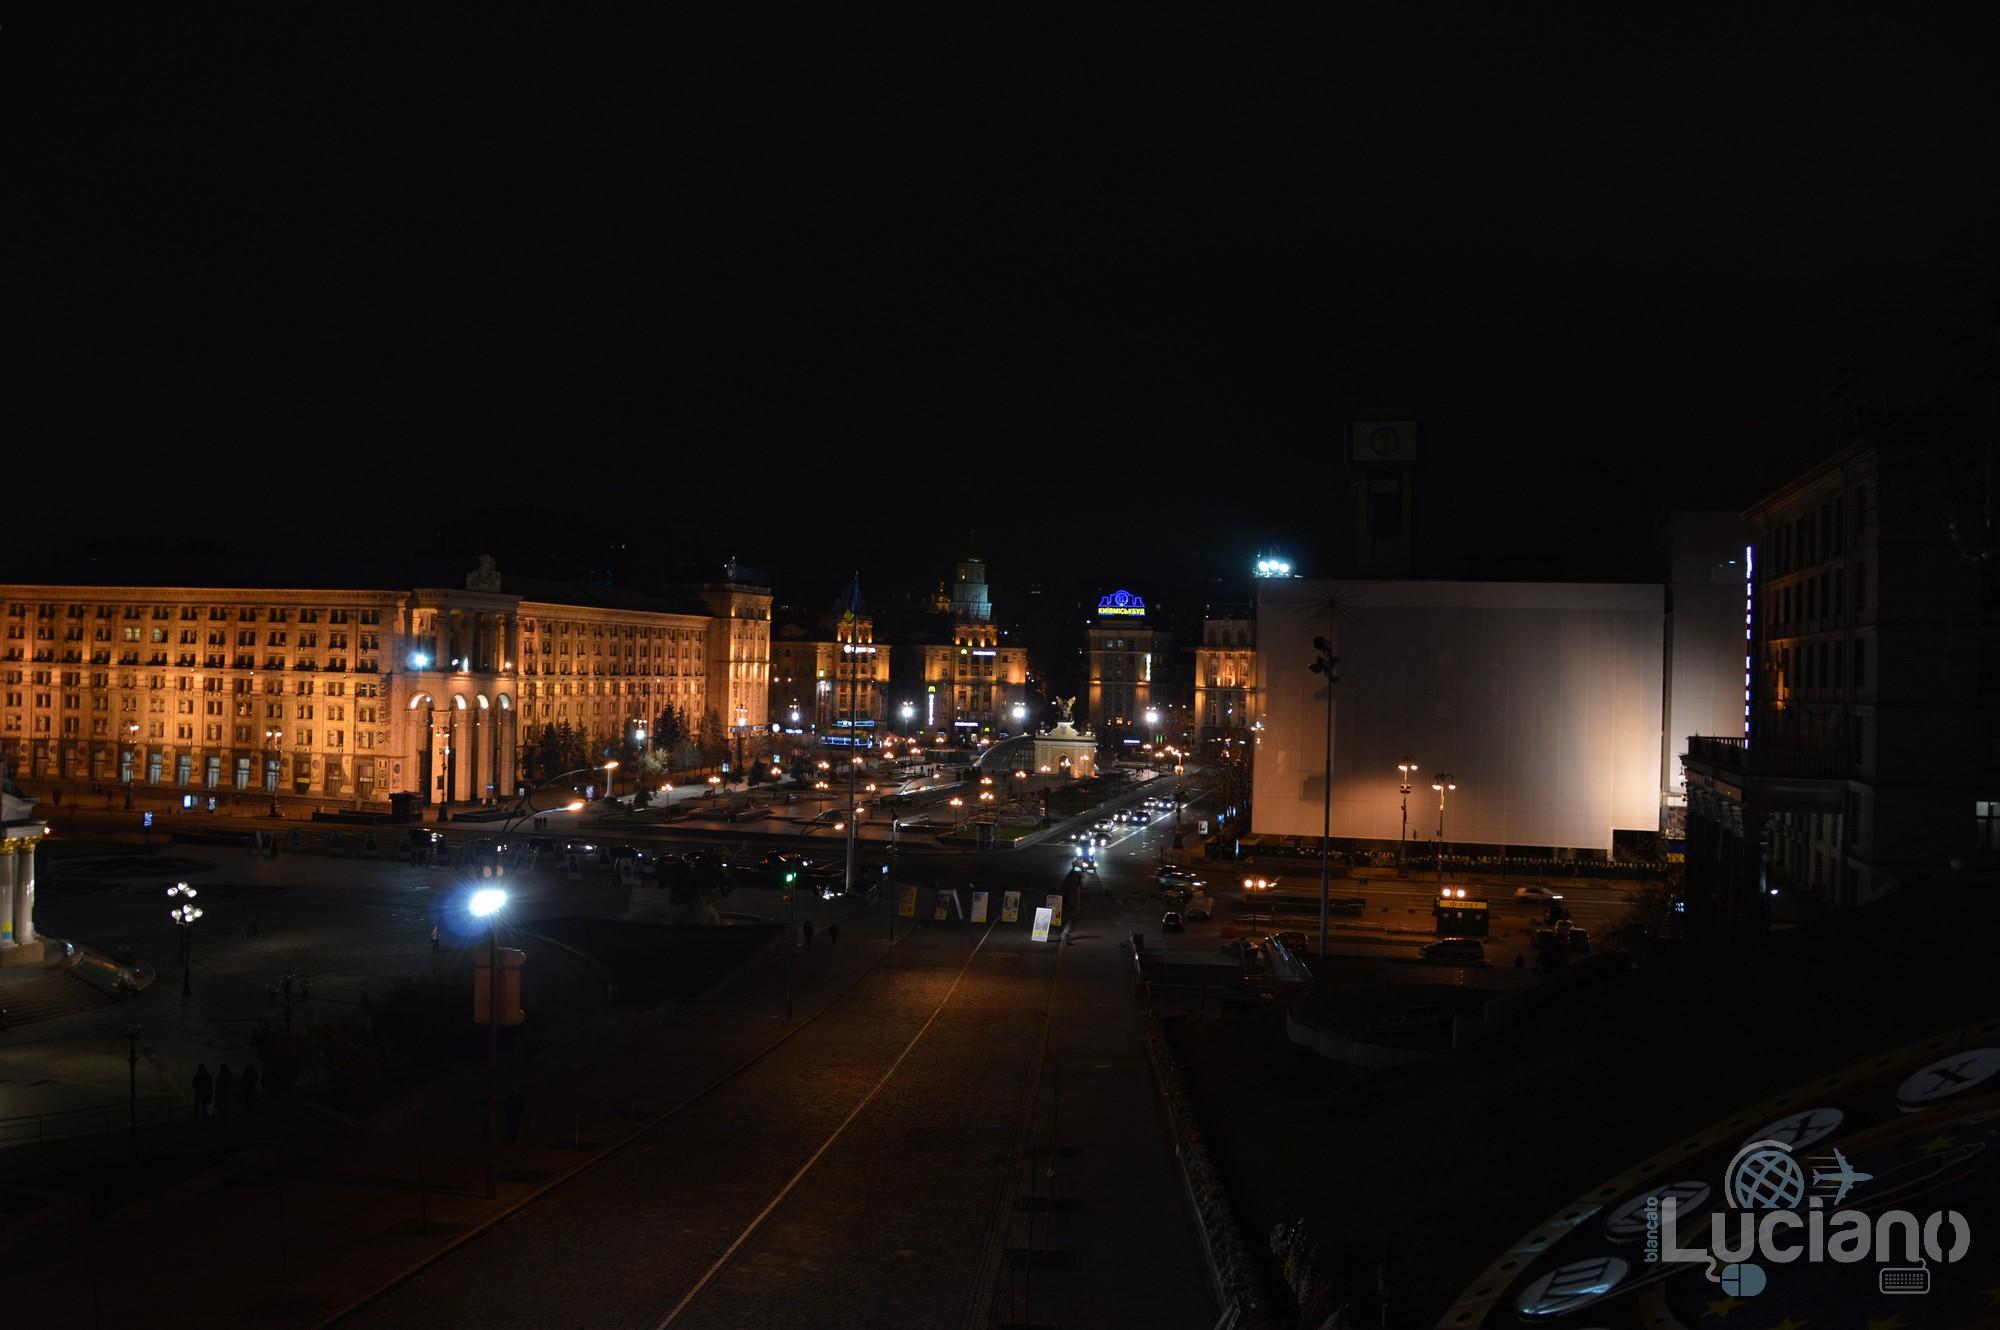 kiev-luciano-blancato-web-site (32)